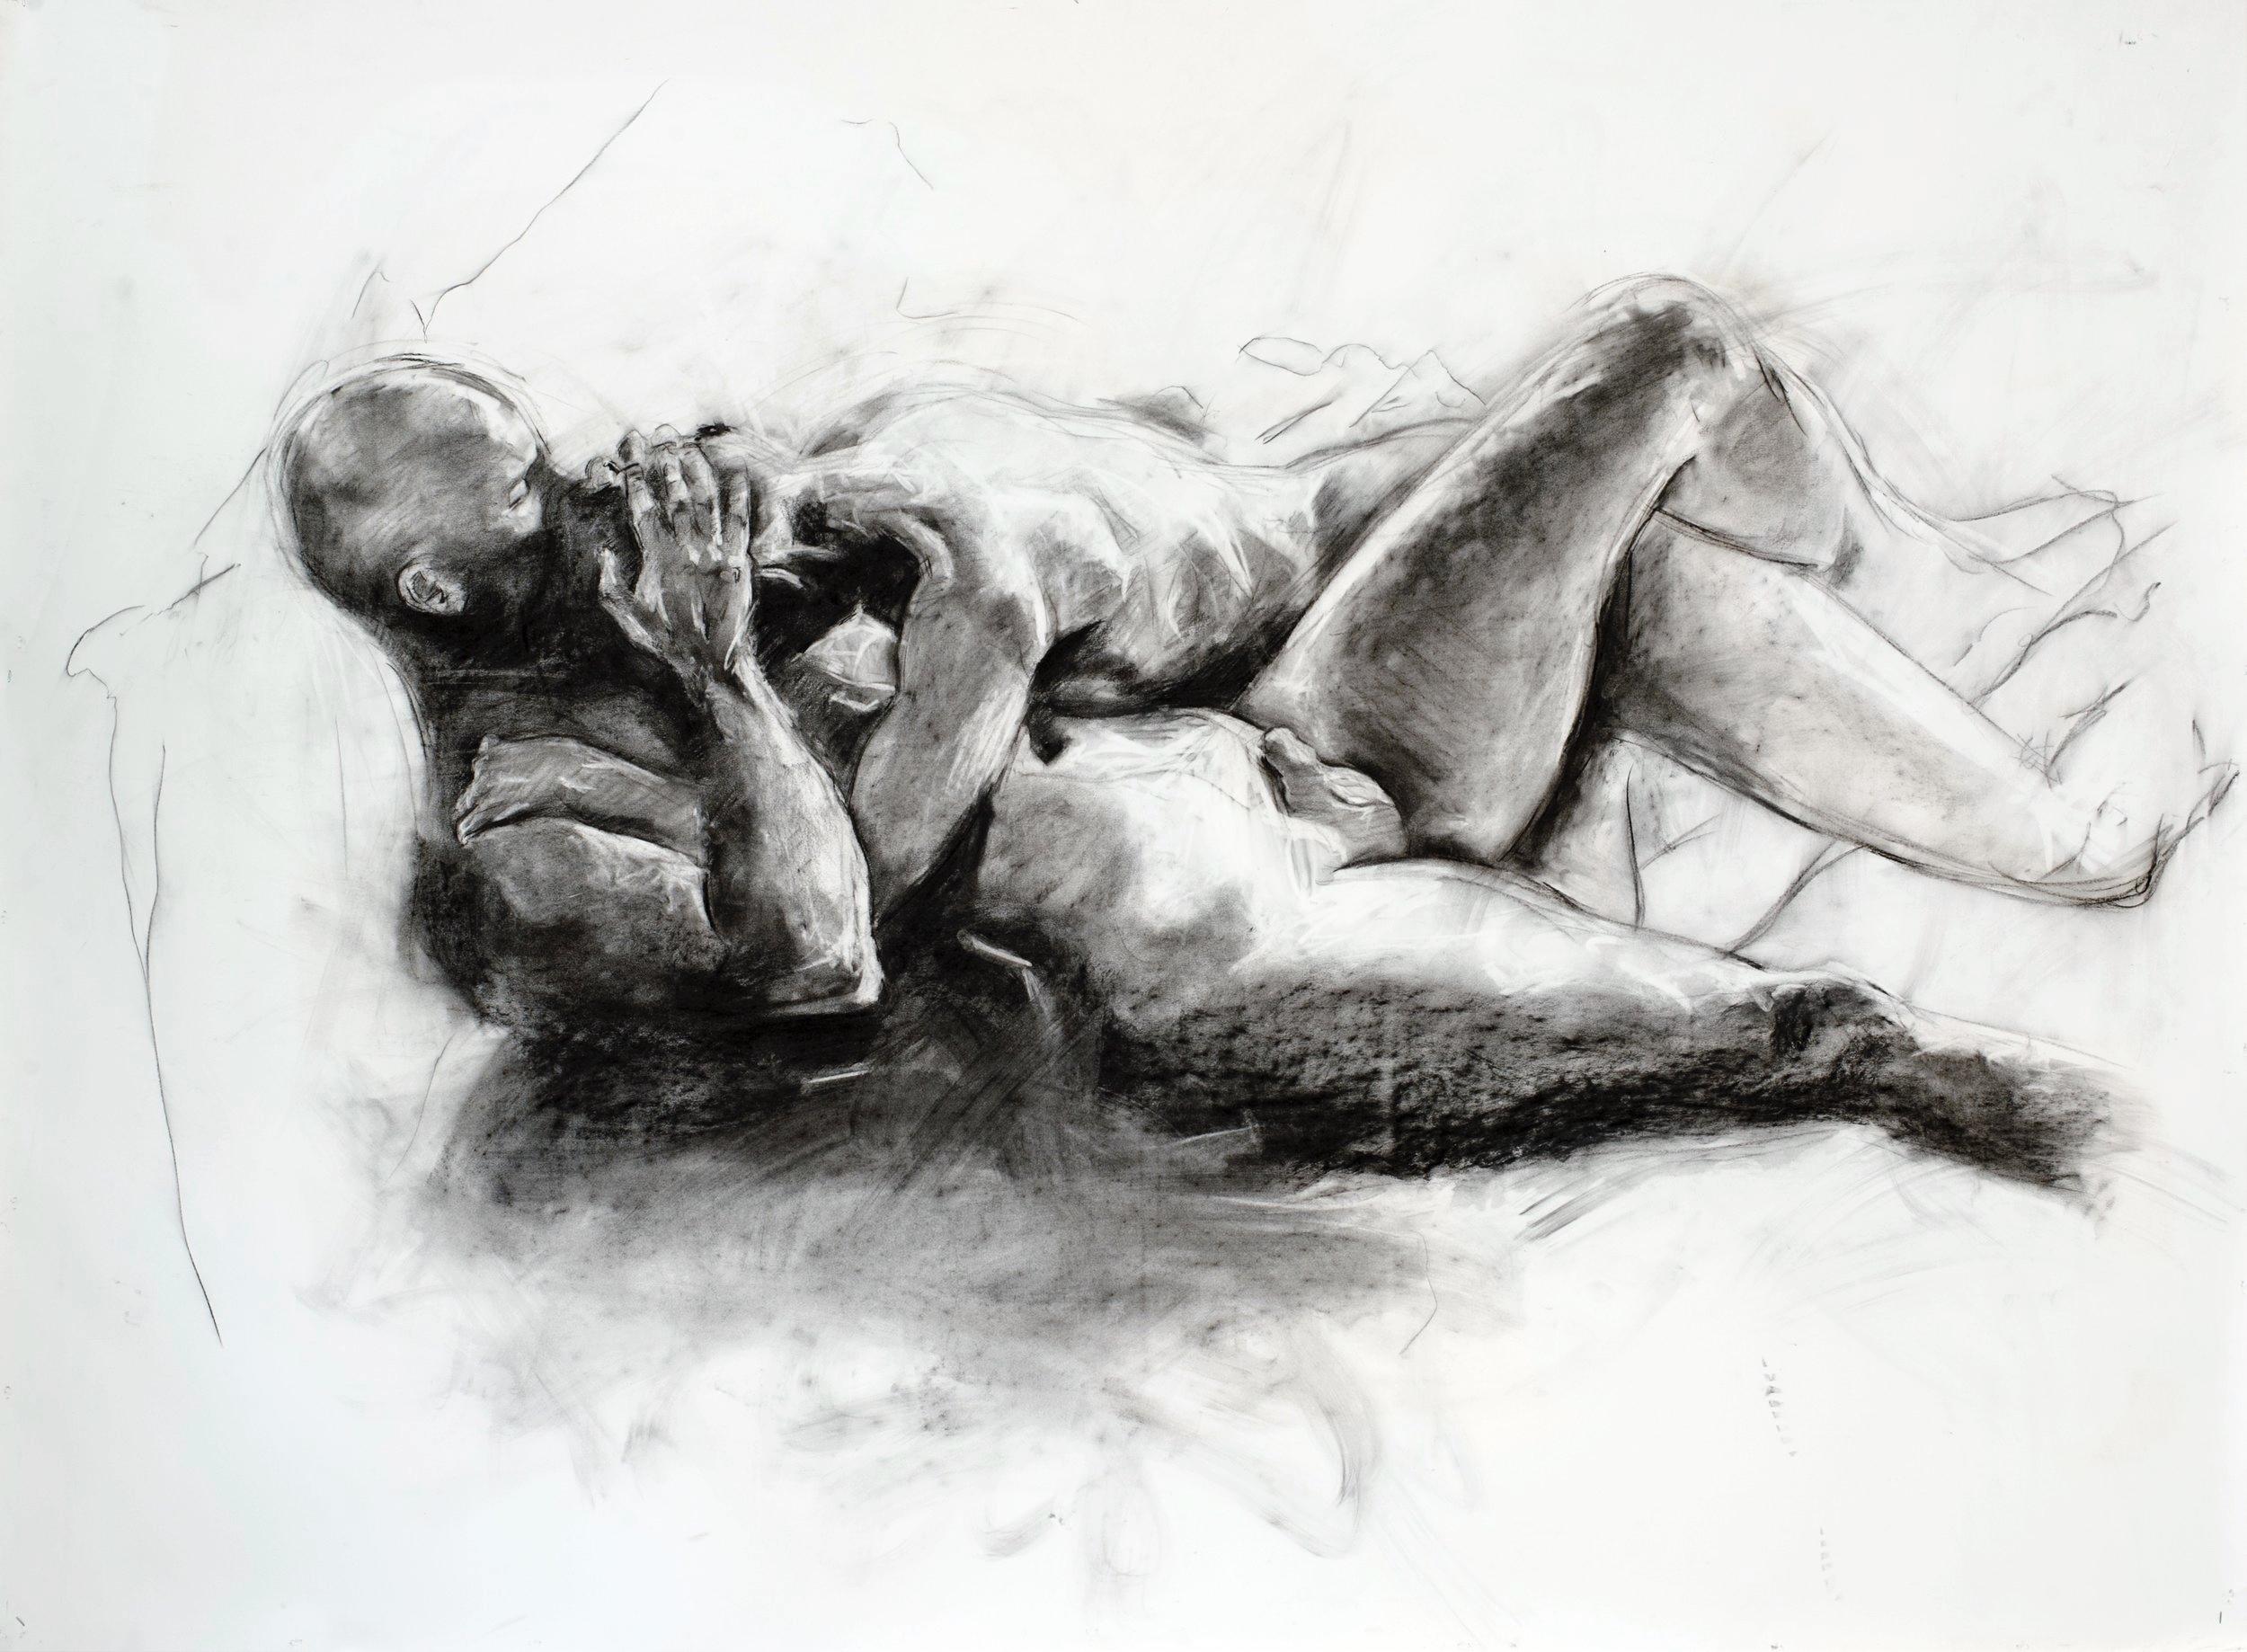 Viscus /vískess/ n. (pl. viscera /víssere/) (usu.in pl) any of the soft internal organs on the body.